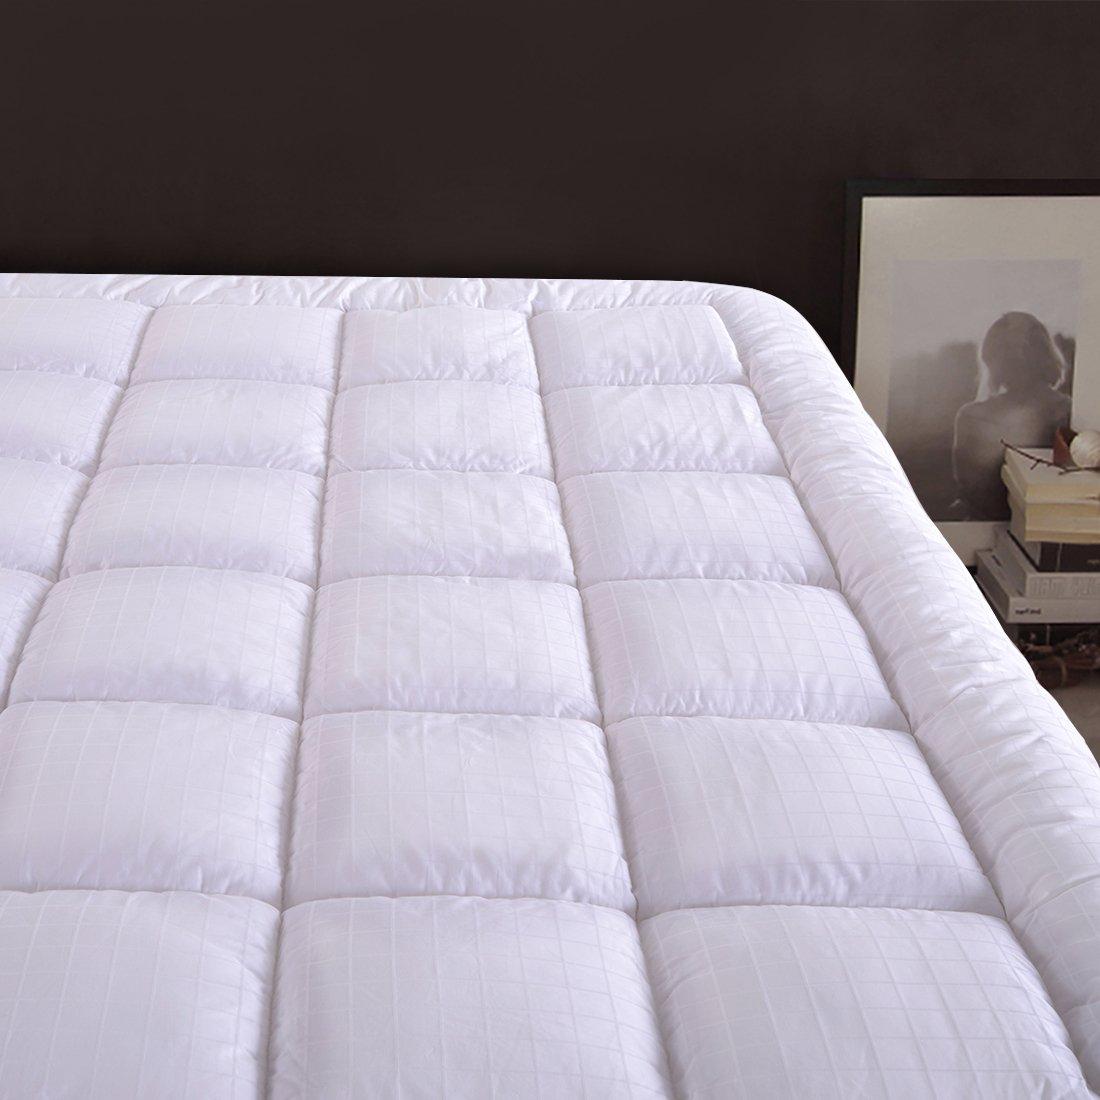 "Cloudream Twin Overfilled Mattress Pad Cover 8-22""Deep Pocket-300TC Snow Down Alternative Pillow Top Mattress Topper"